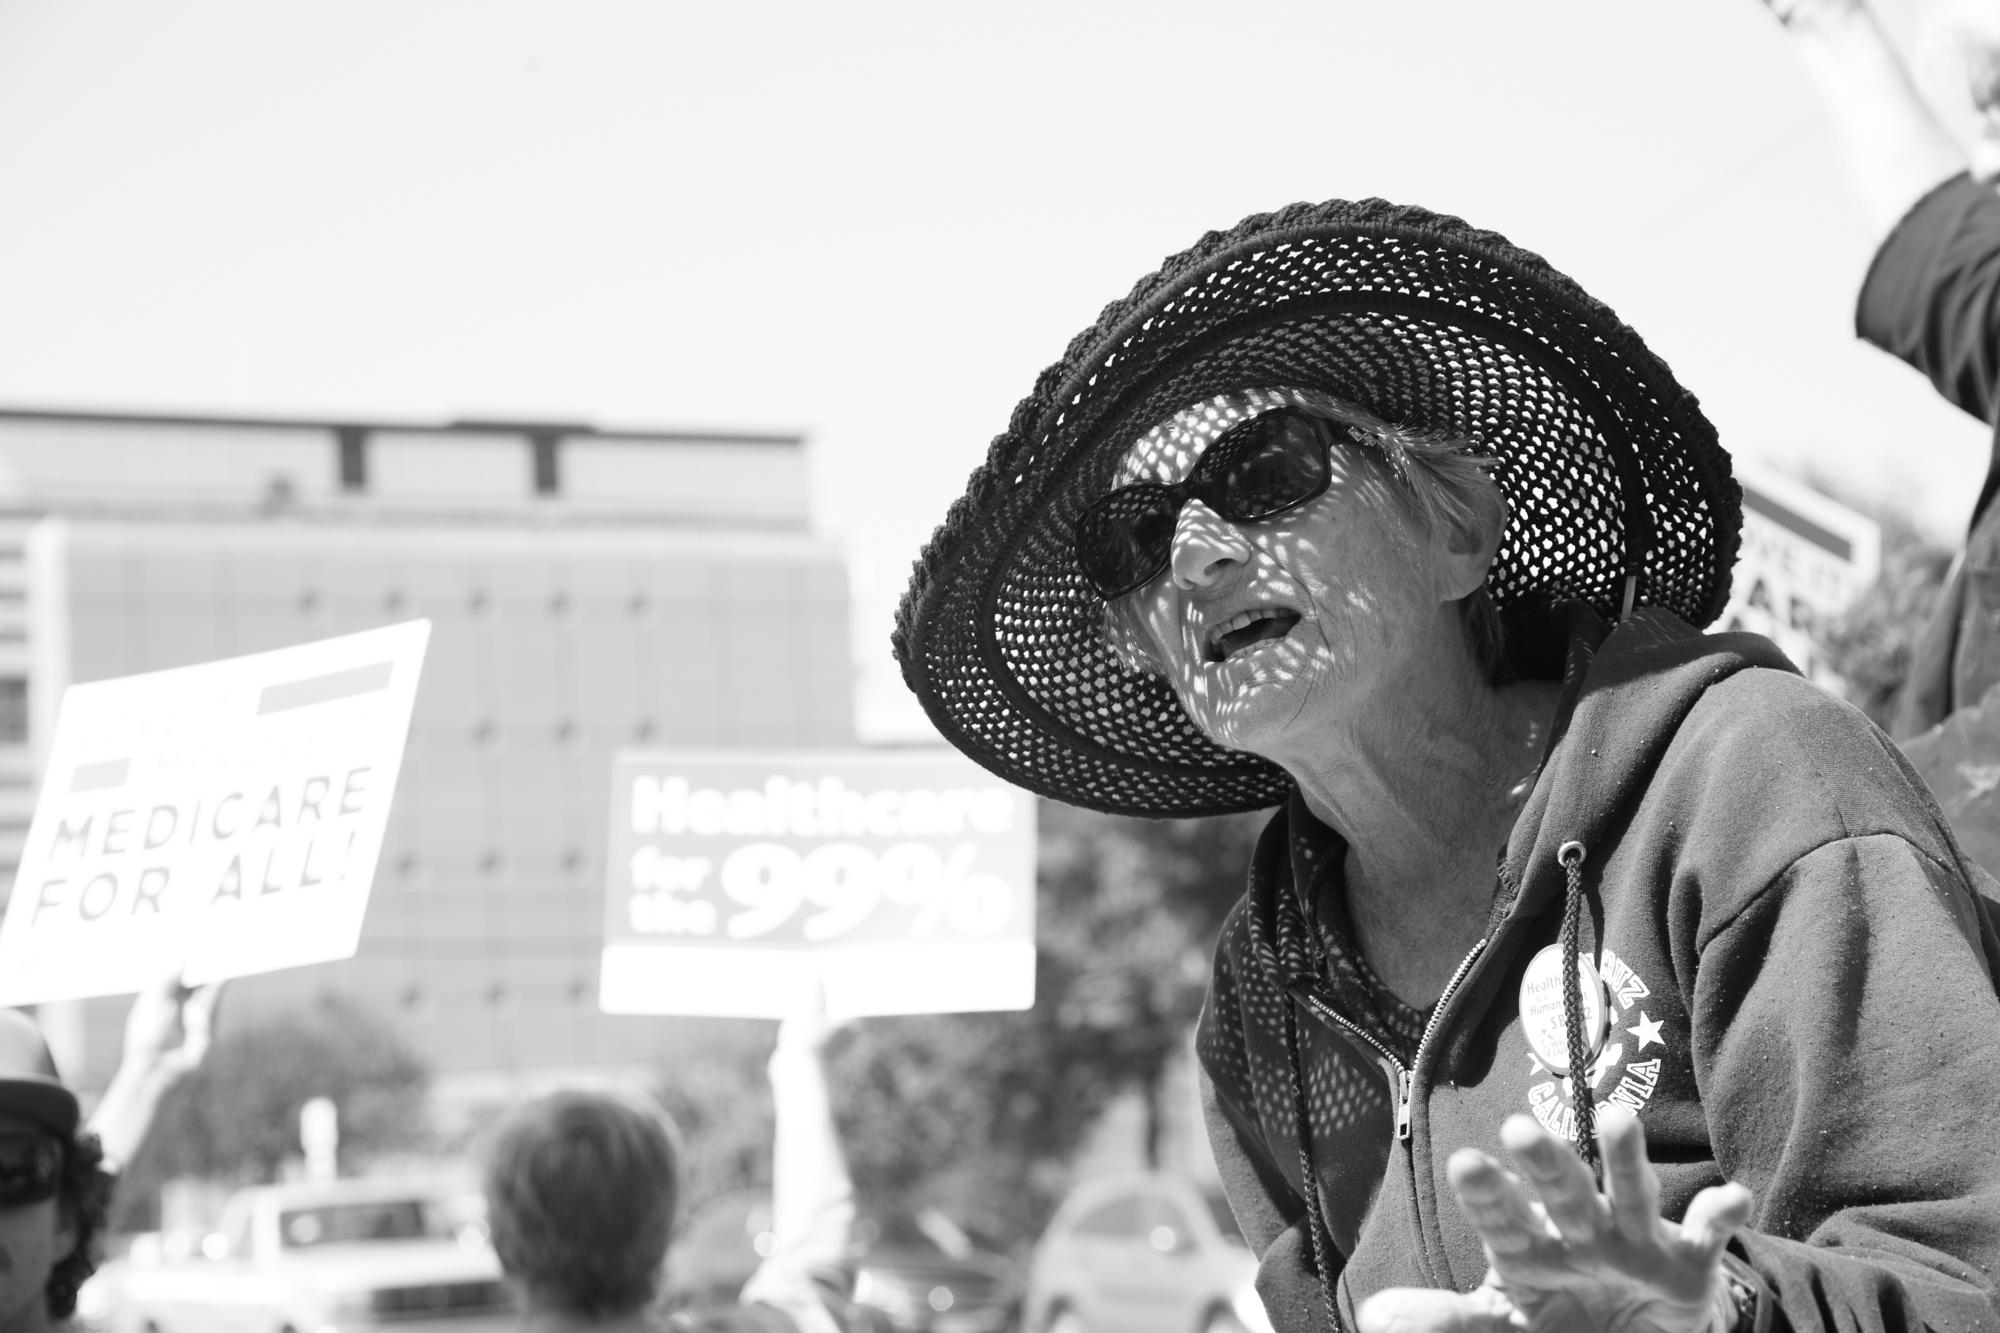 sb 562 Jim wood Protest .5Res-21.jpg